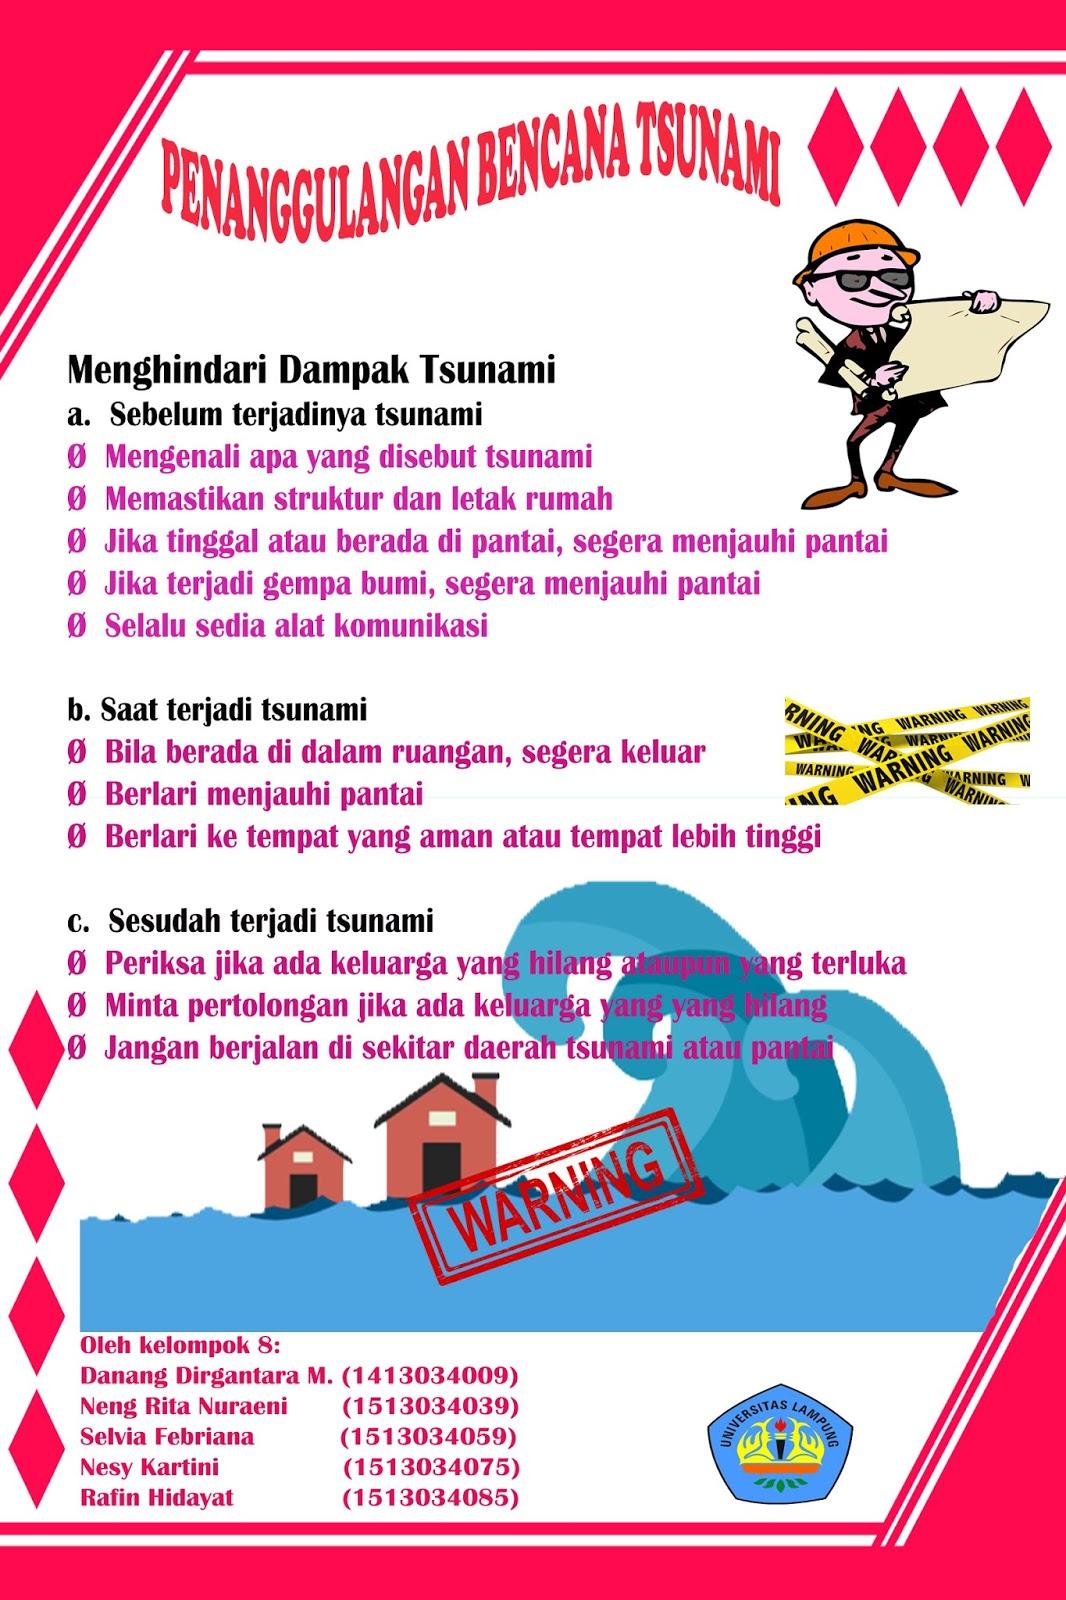 Contoh Poster Mitigasi Bencana Tsunami Artikel Unik